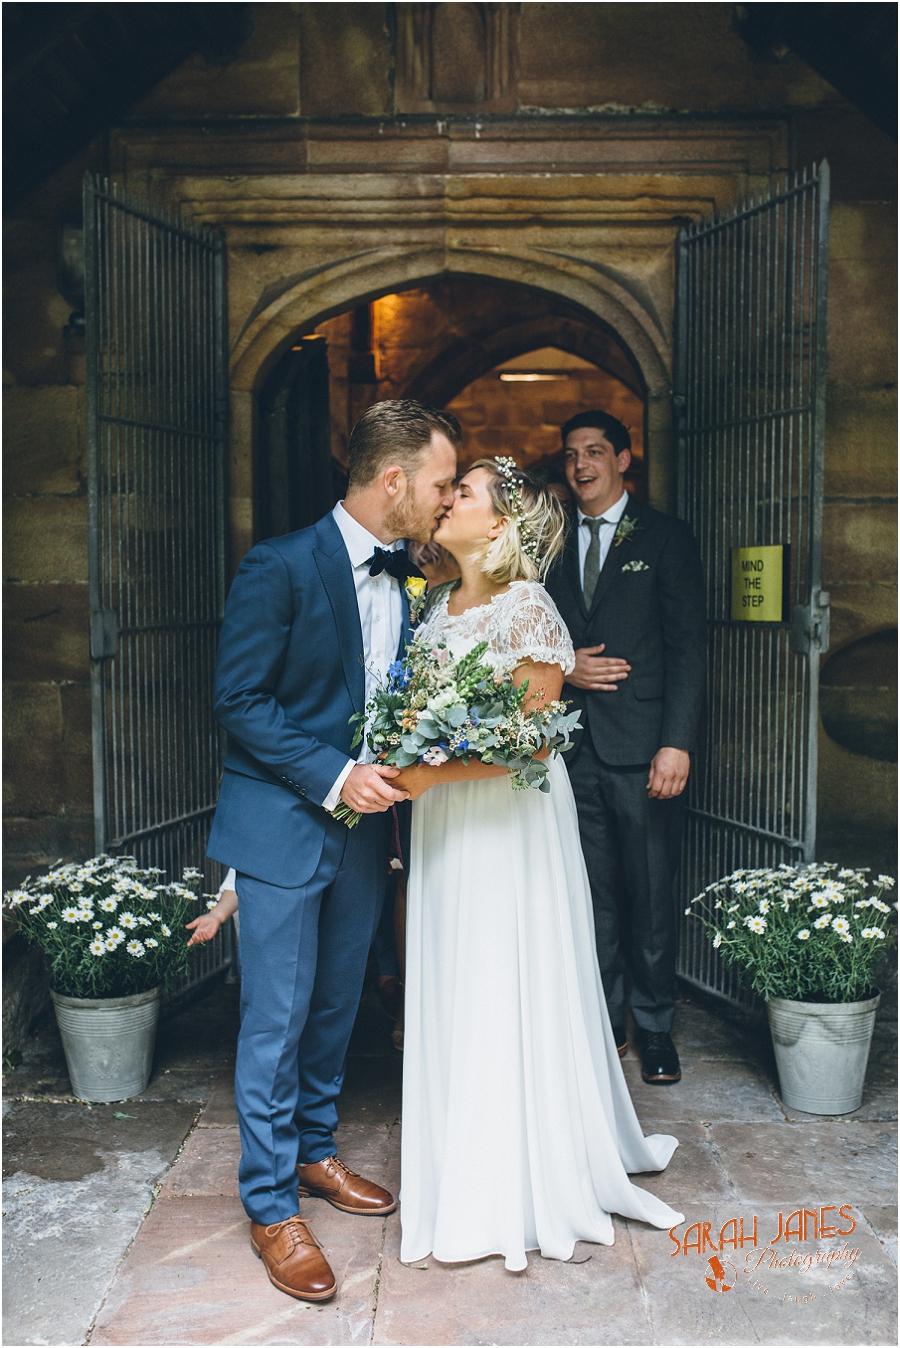 Wedding photography Kings Acre, Farm wedding, Marquee wedding photography, Sarah Janes Photography_0019.jpg